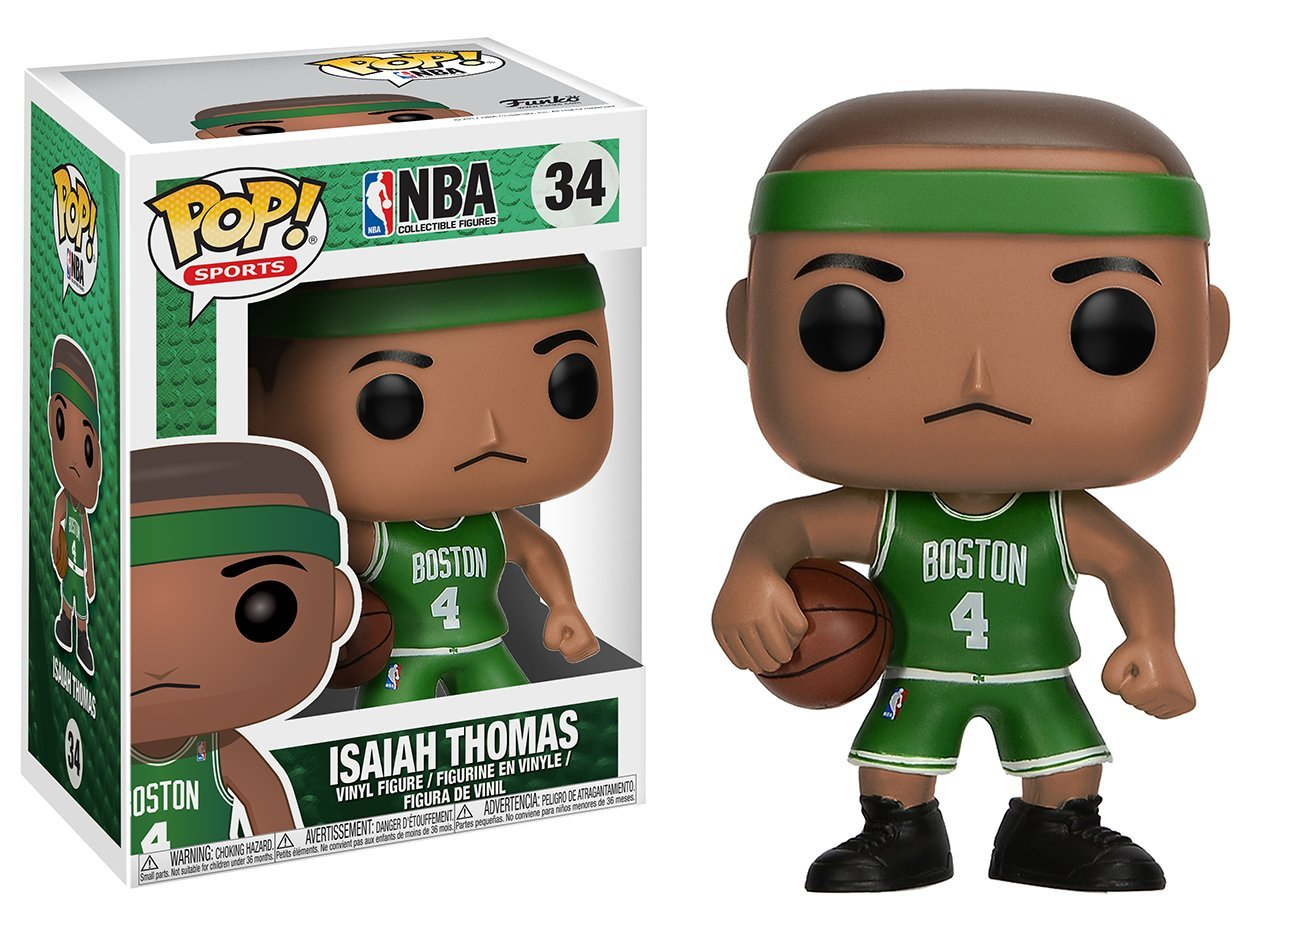 Funko Pop Isaiah Thomas Boston Celtics (NBA 34) Funko Pop NBA